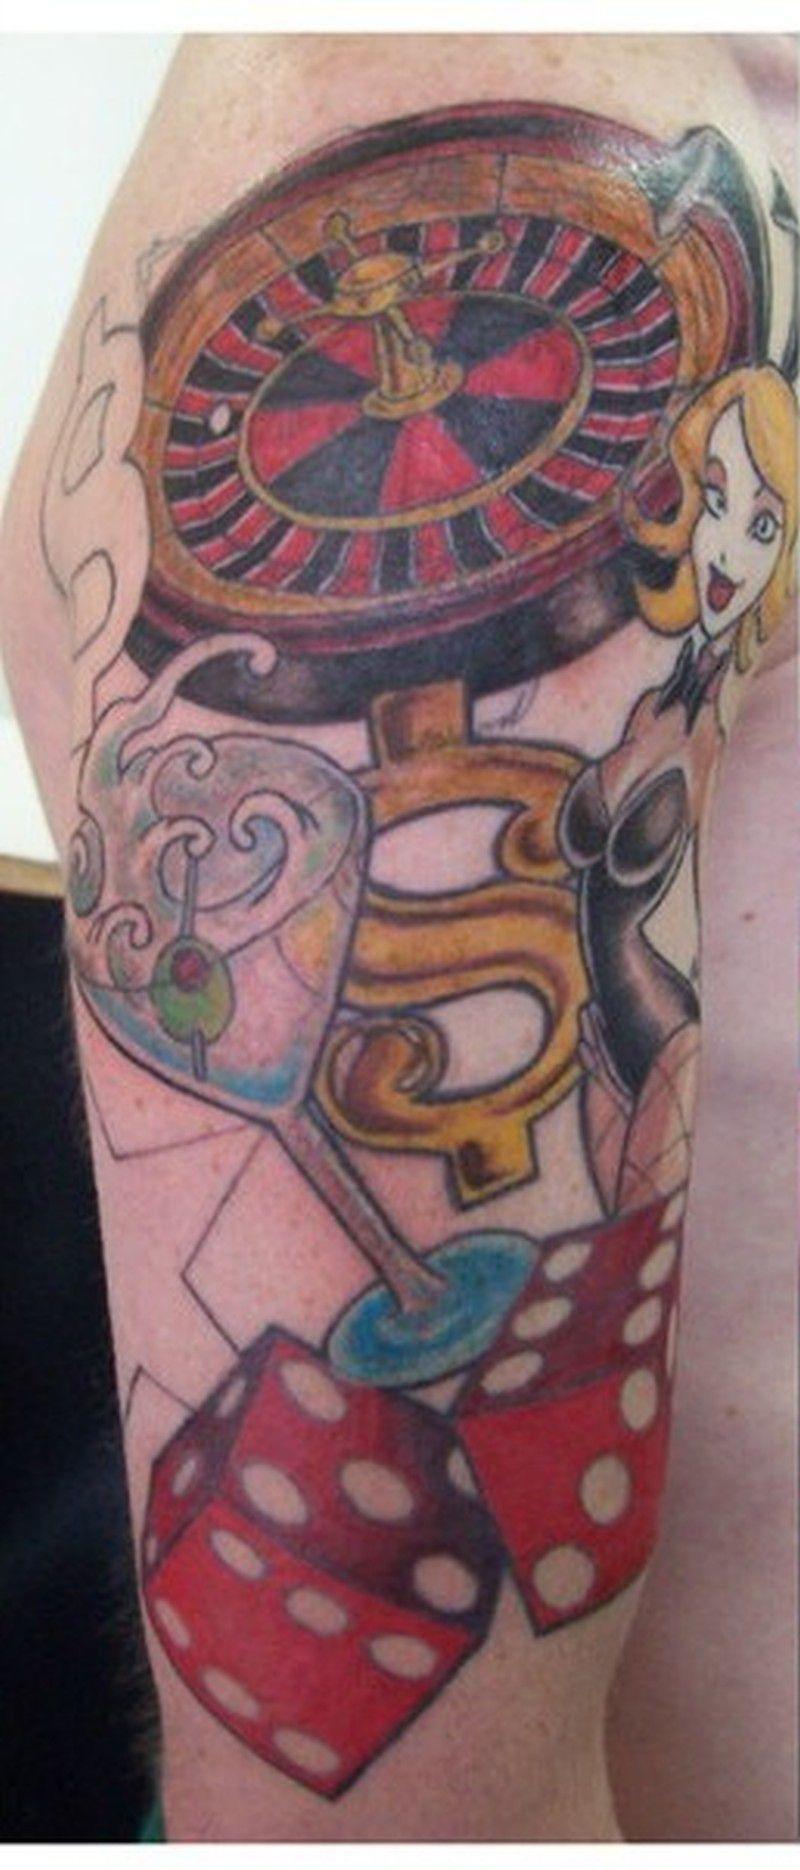 efe017440 Elegant gambling tattoo designs on sleeve   Gambling gifts mom ...